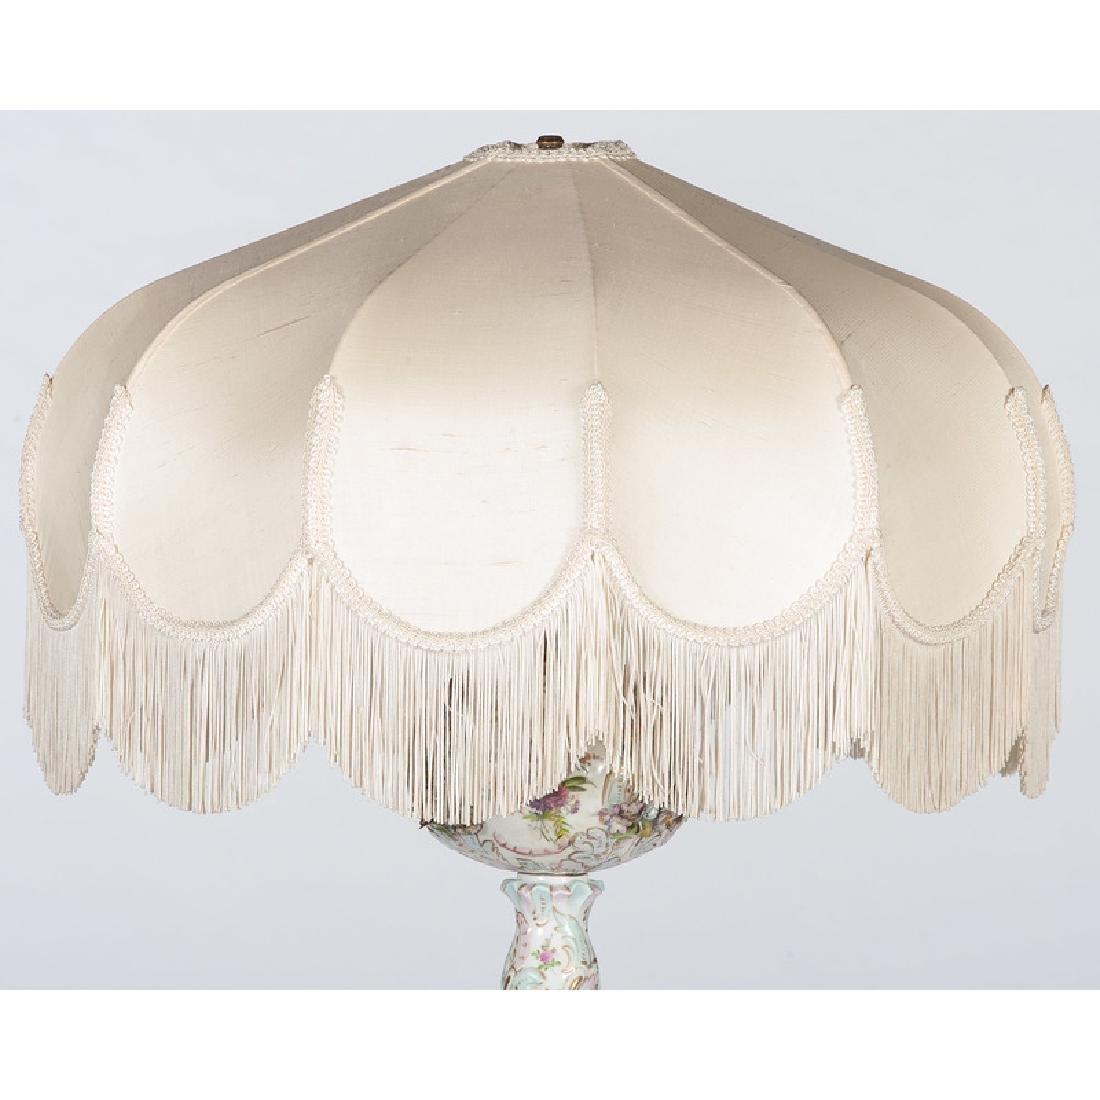 Carl Thieme Porcelain Floor Lamp - 2